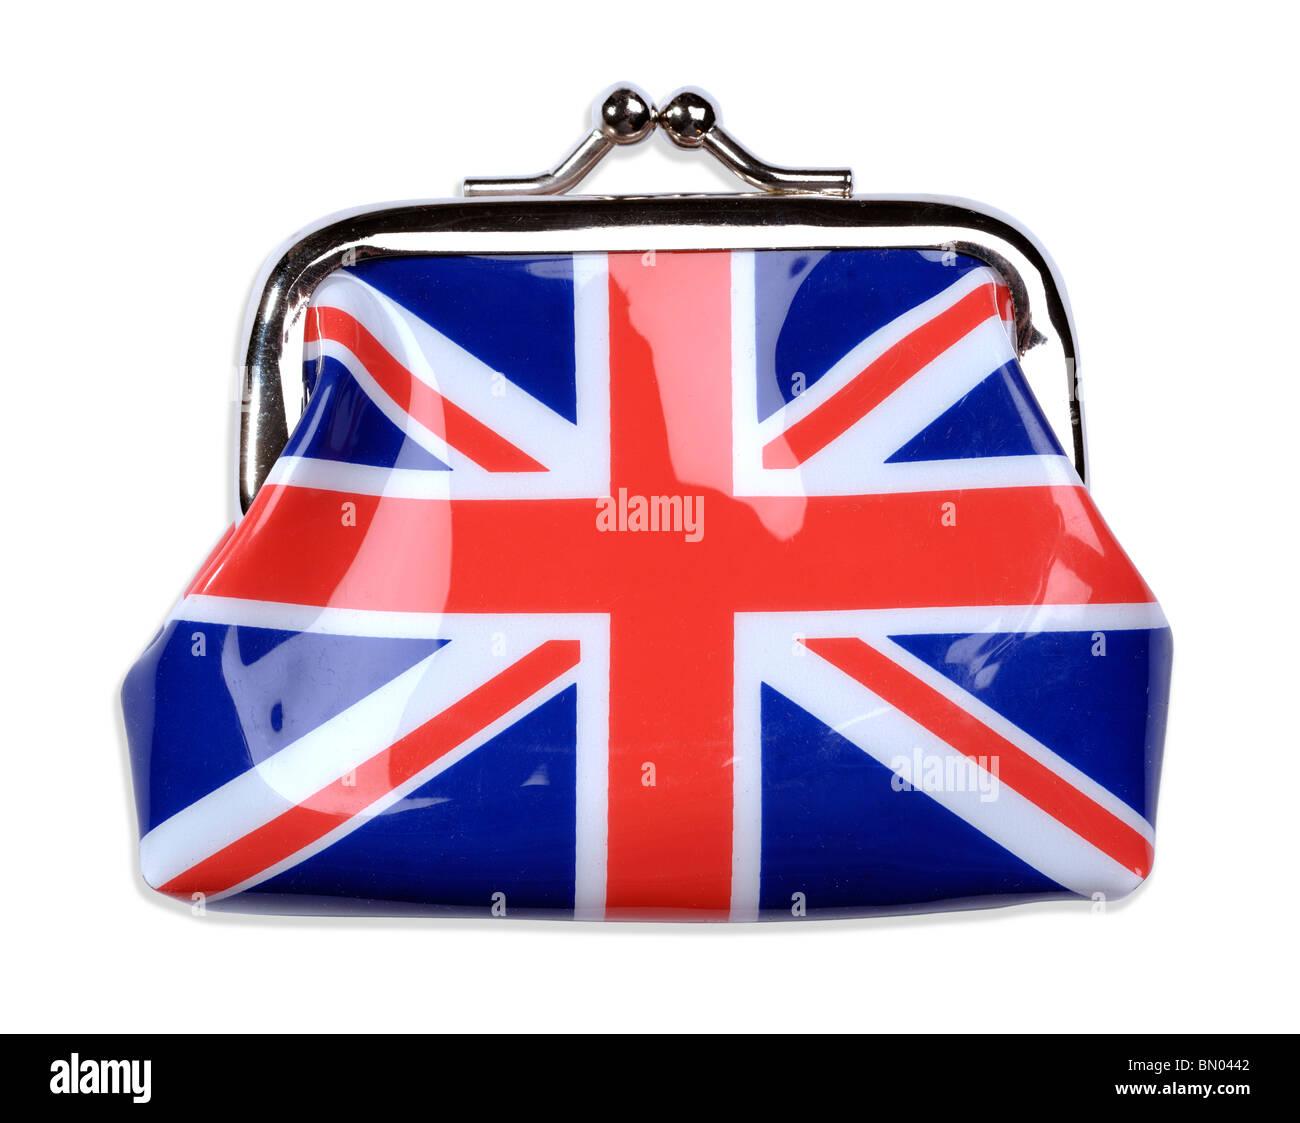 Union Jack purse - Stock Image